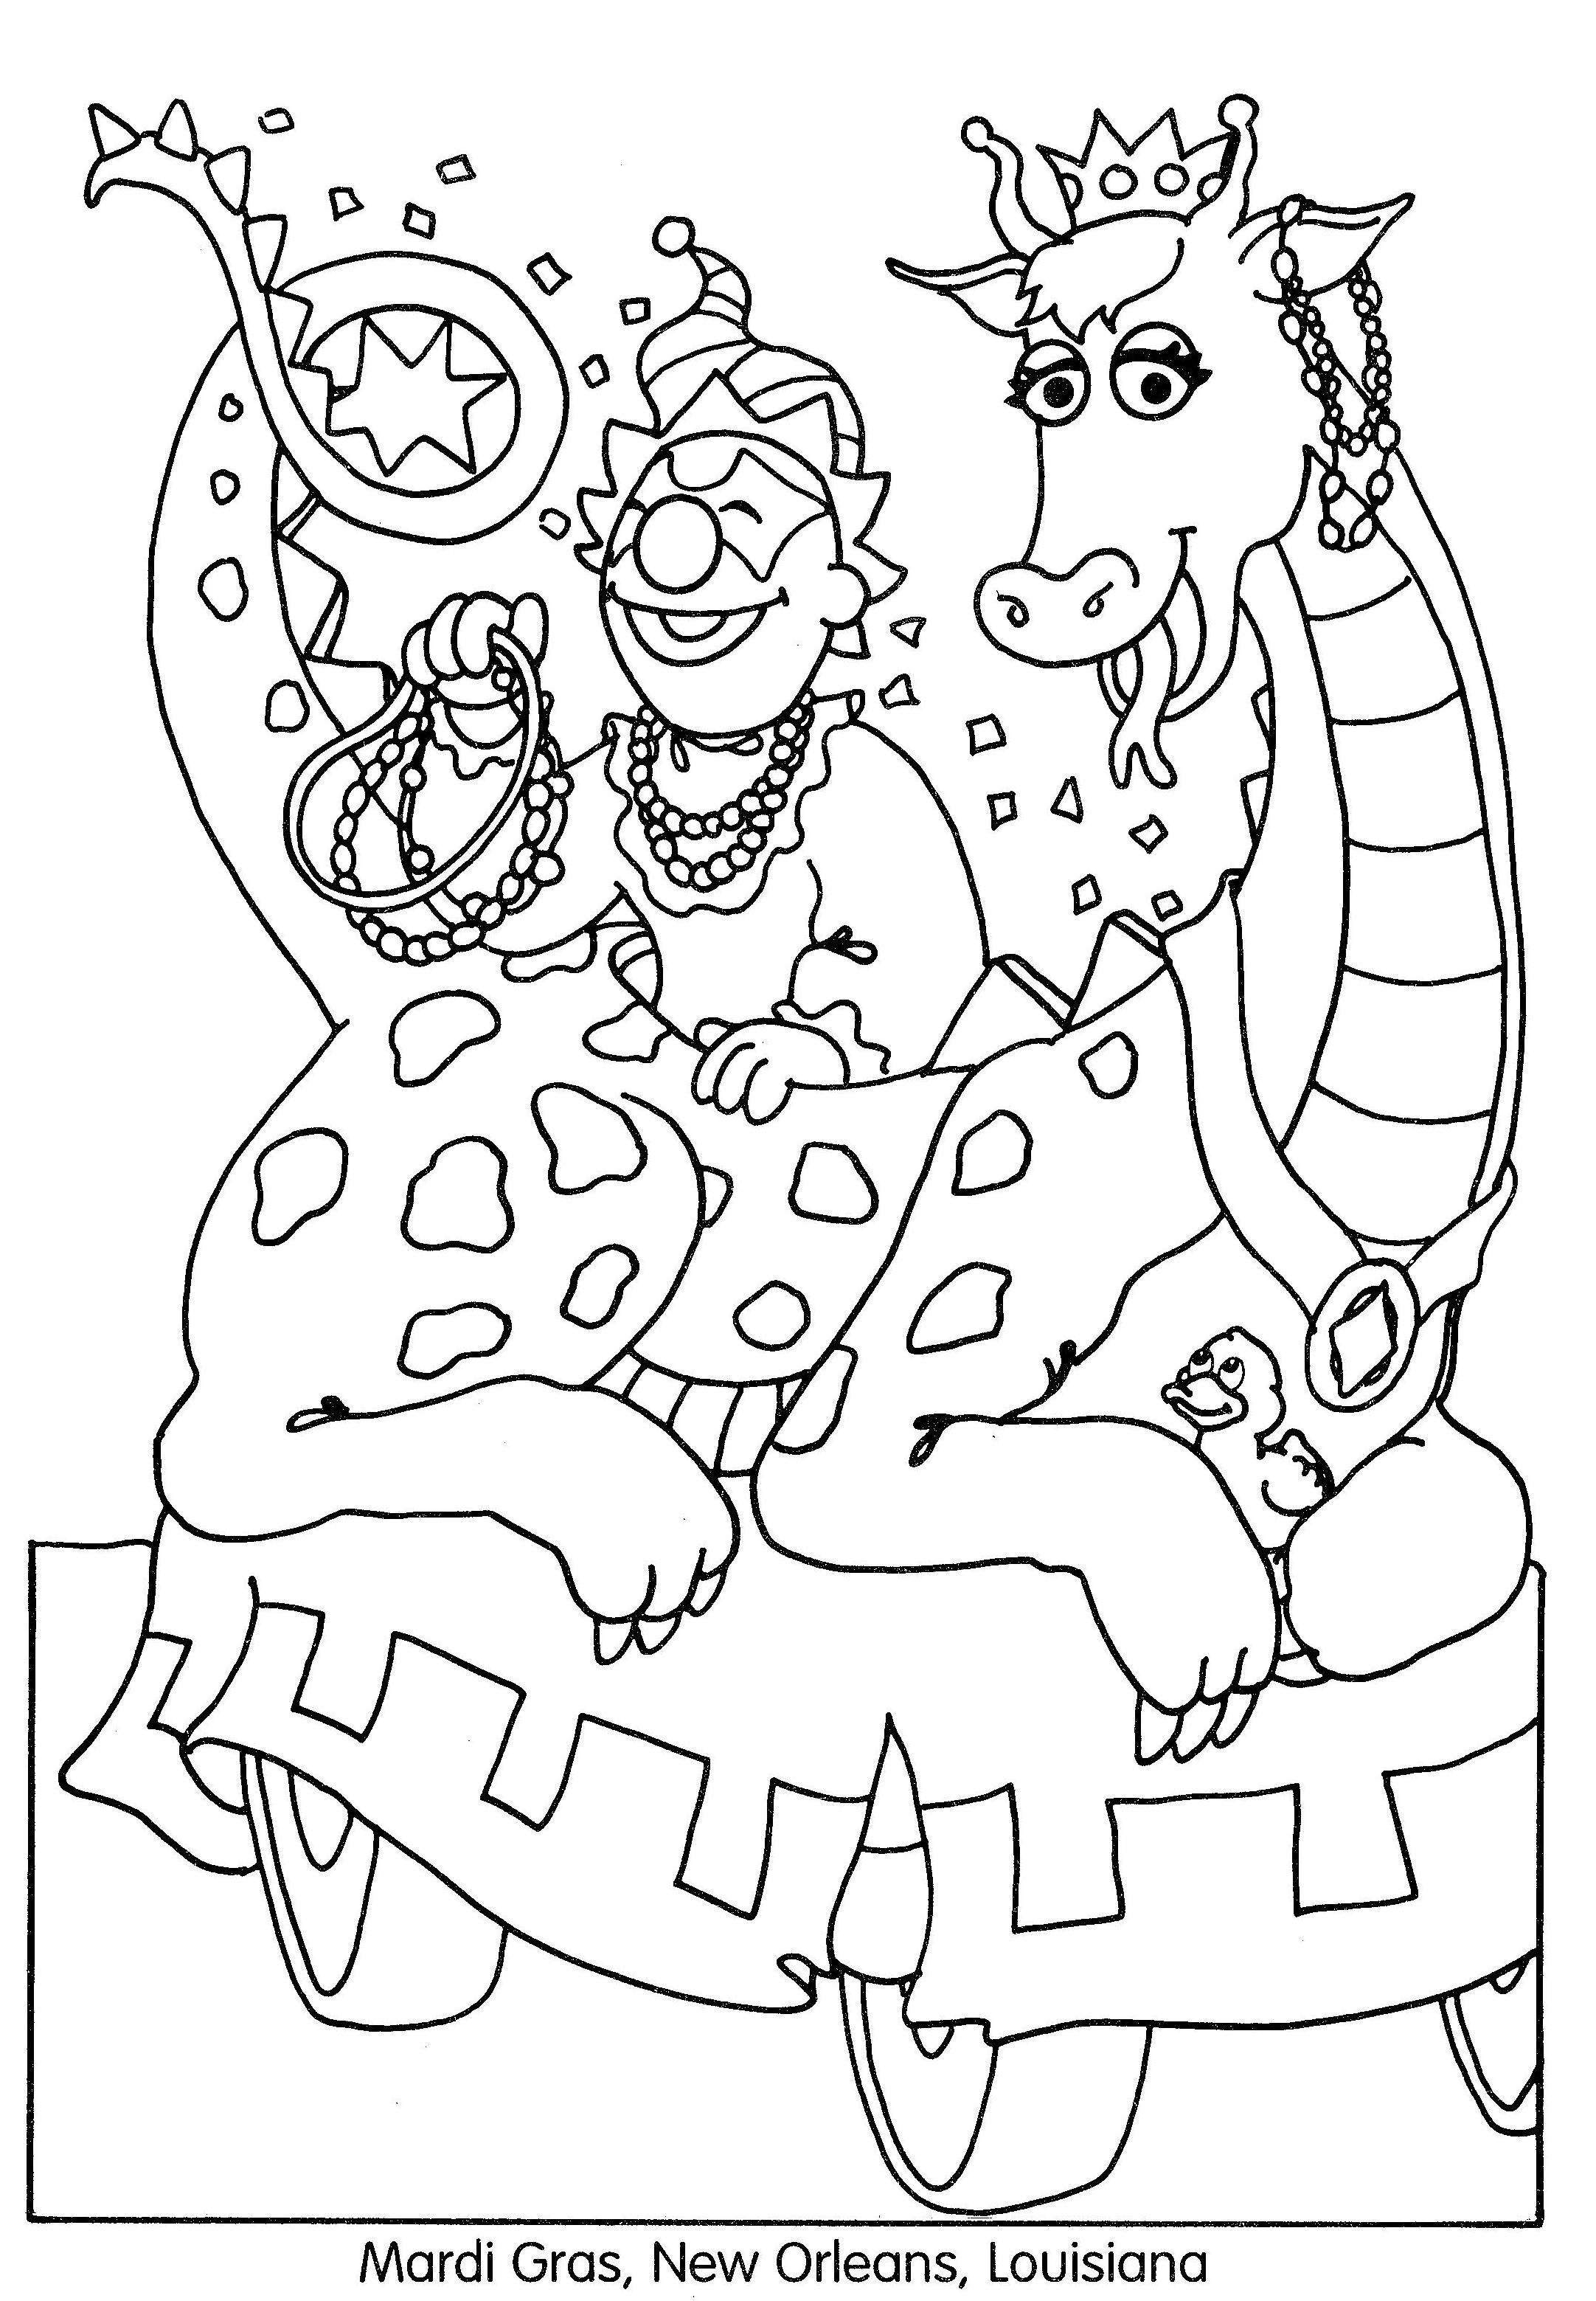 Mardi Gras Coloring Sheets For Kids  mardi gras coloring pages free coloring pages for kids 18